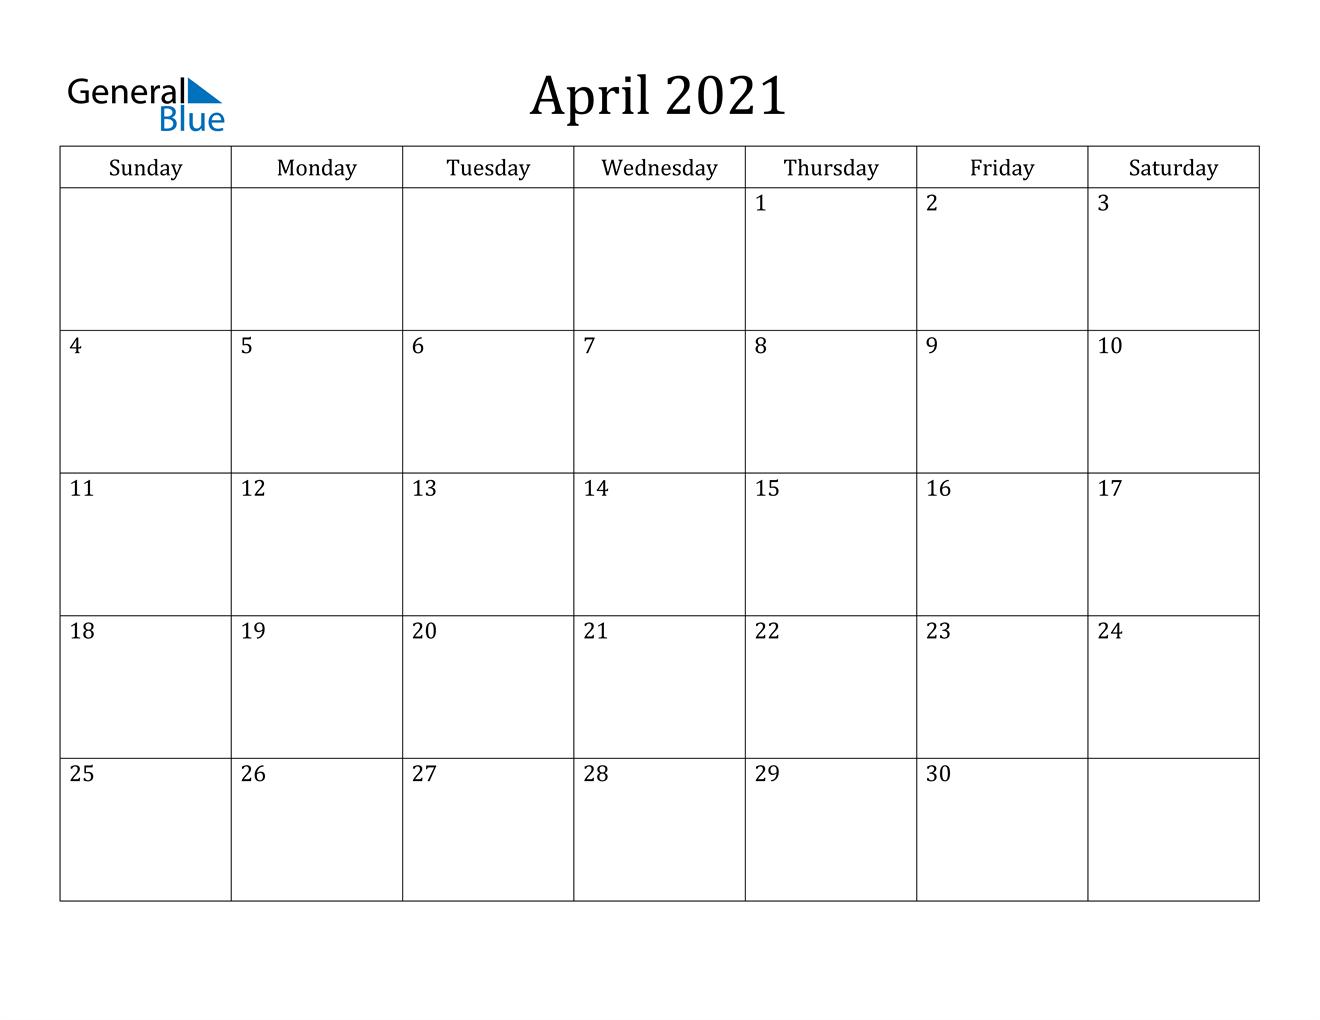 Psu Academic Calendar 2022.Academic Calendar Oracle Psu Calendar April 2021